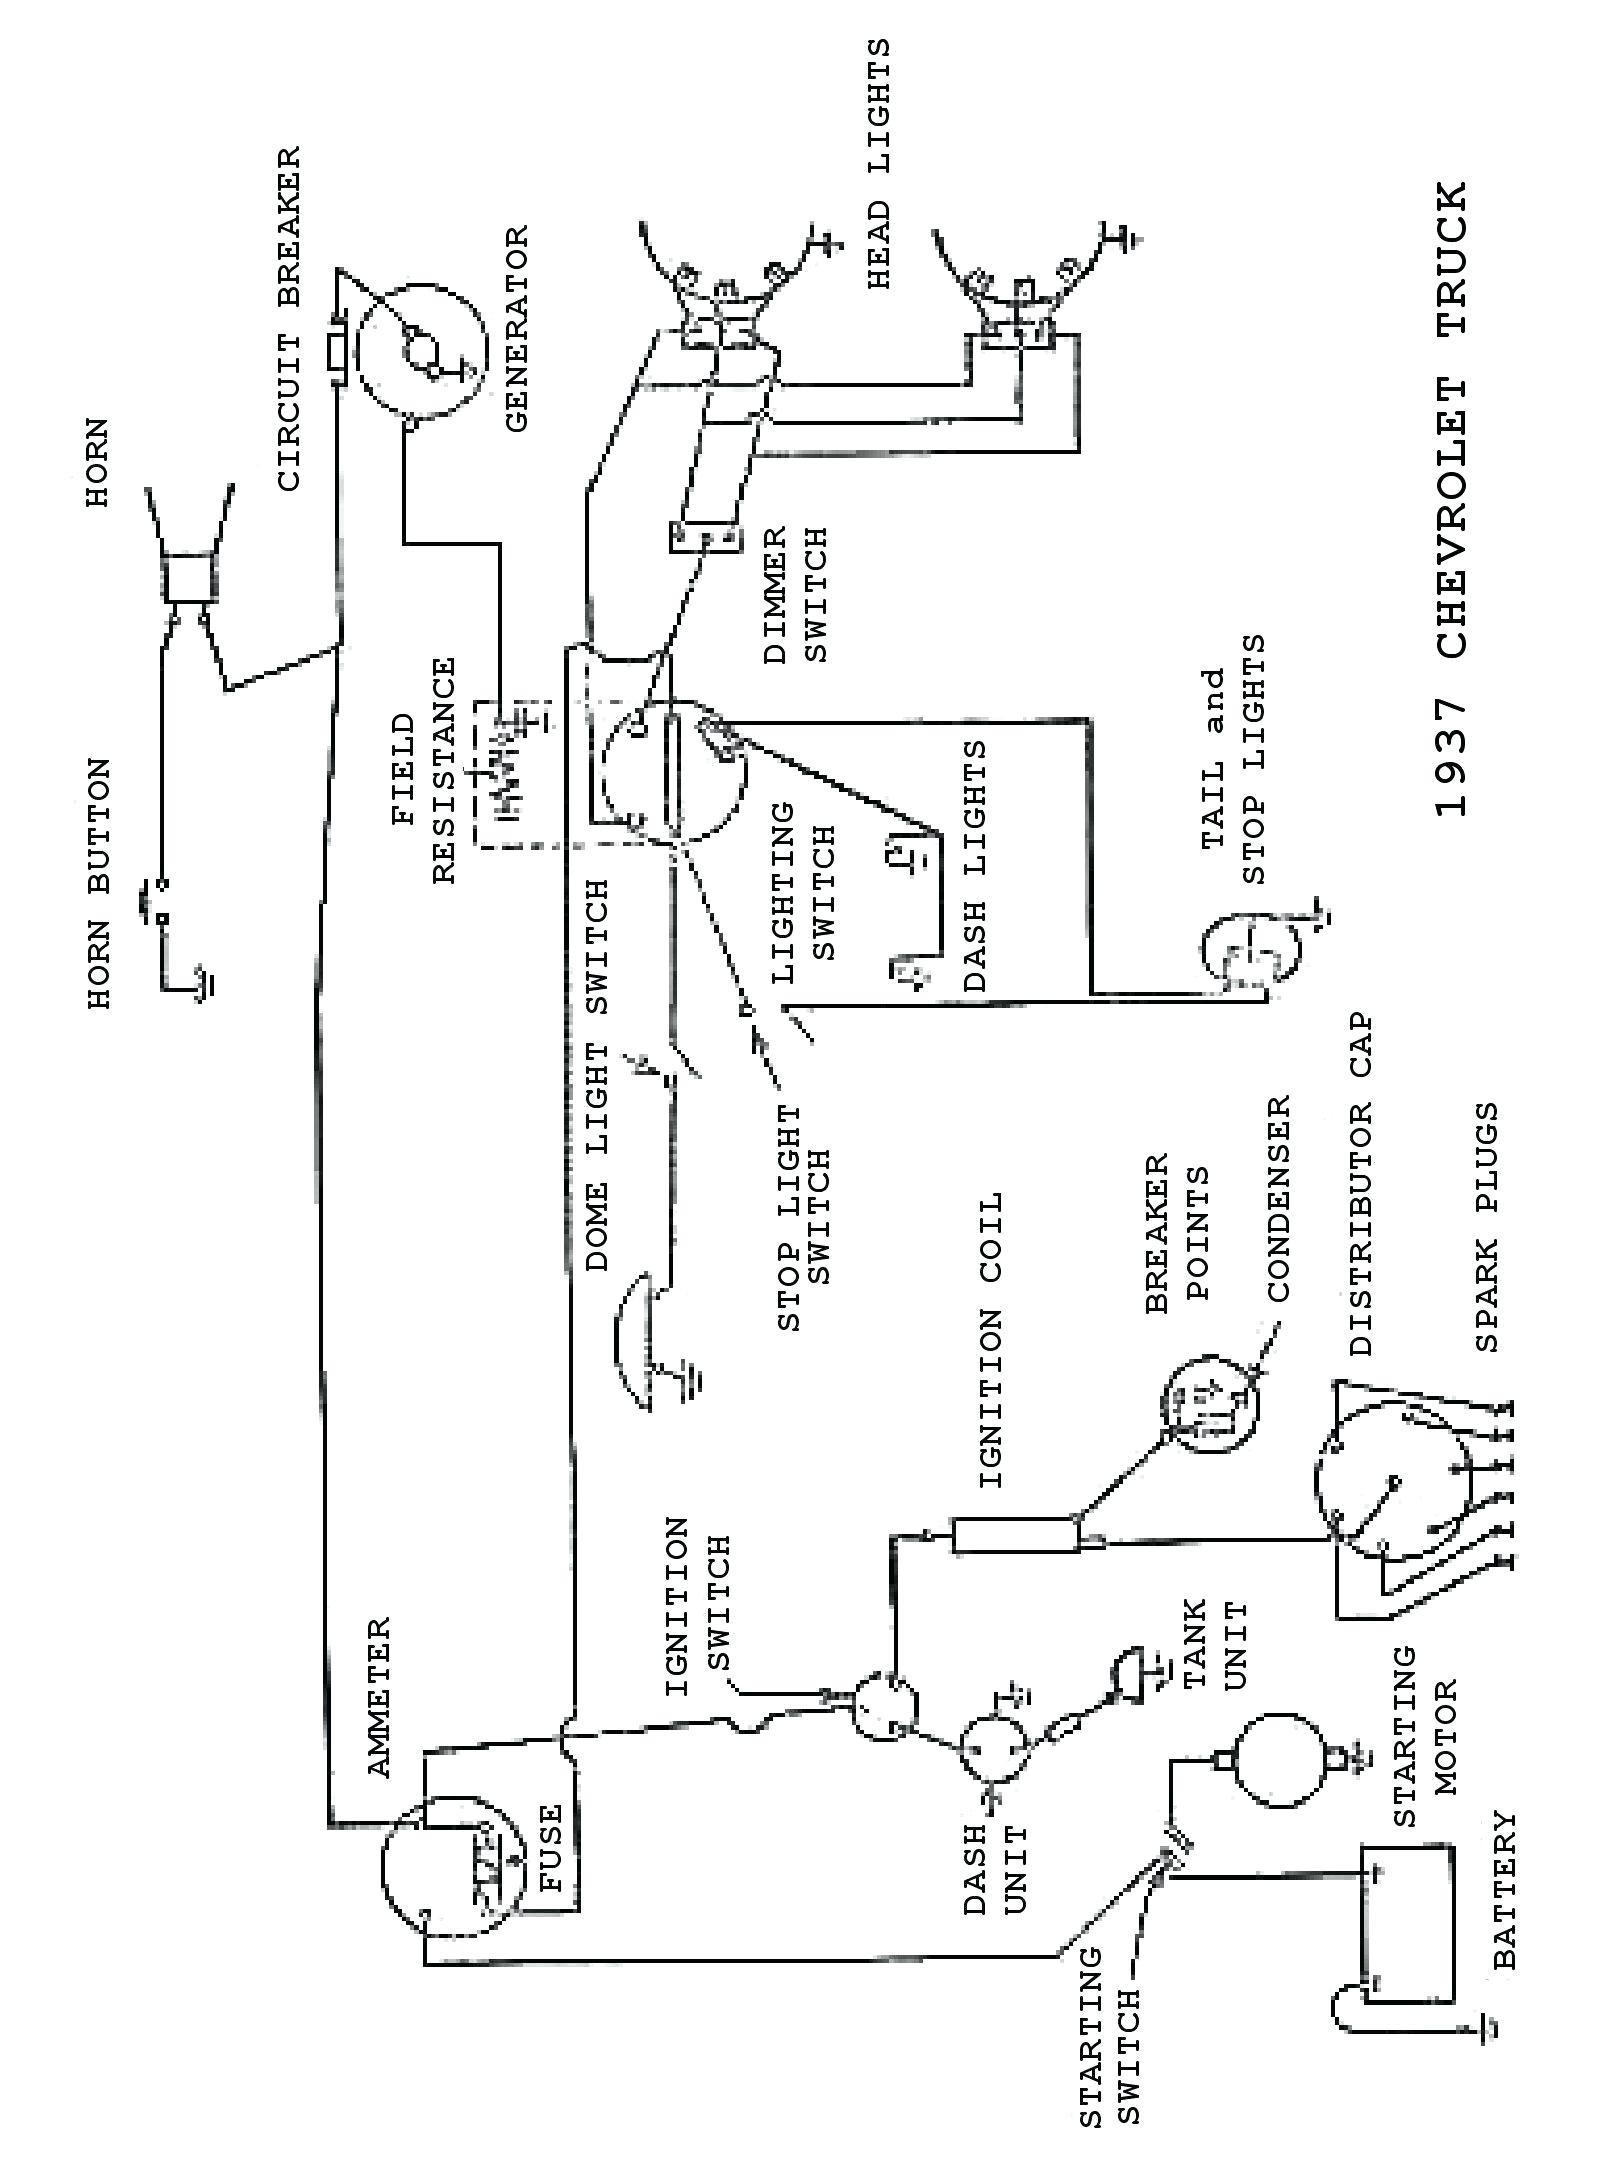 Starter 4020 24 Volt System Wiring Diagram